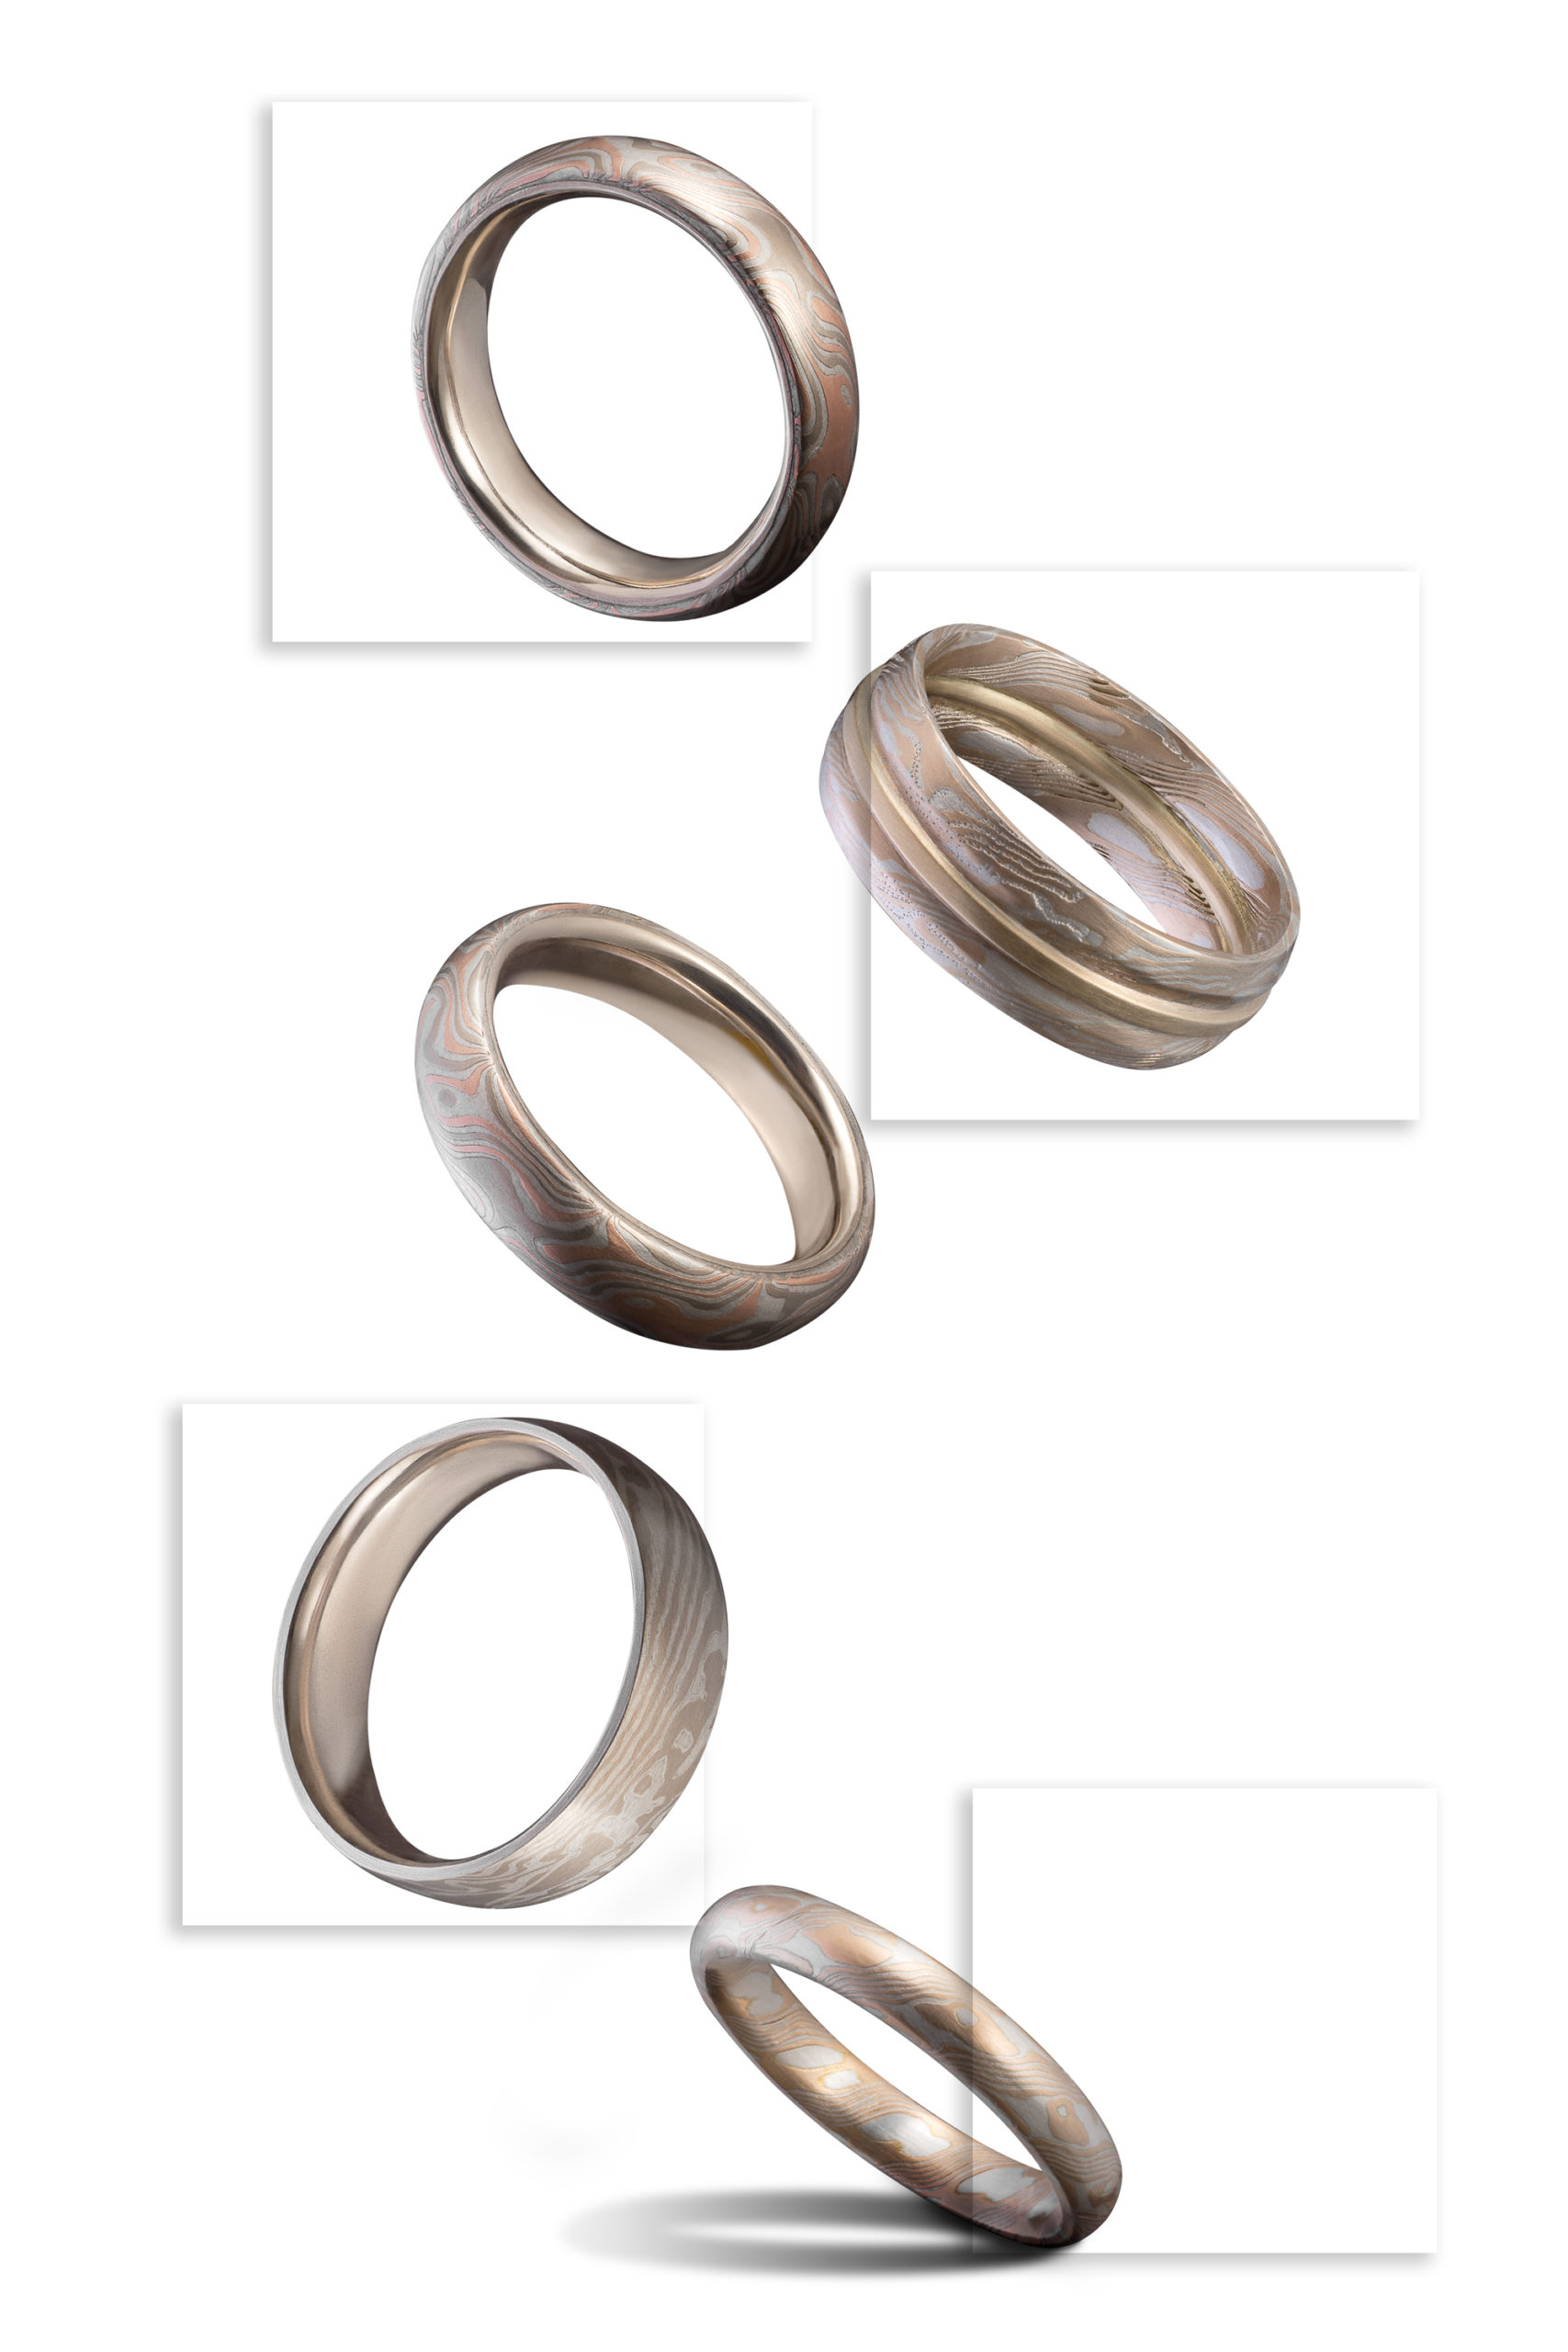 Jewellery photography with Object Maker-Mokume Gane-levating ring set-wenbozhao photography-Sydney